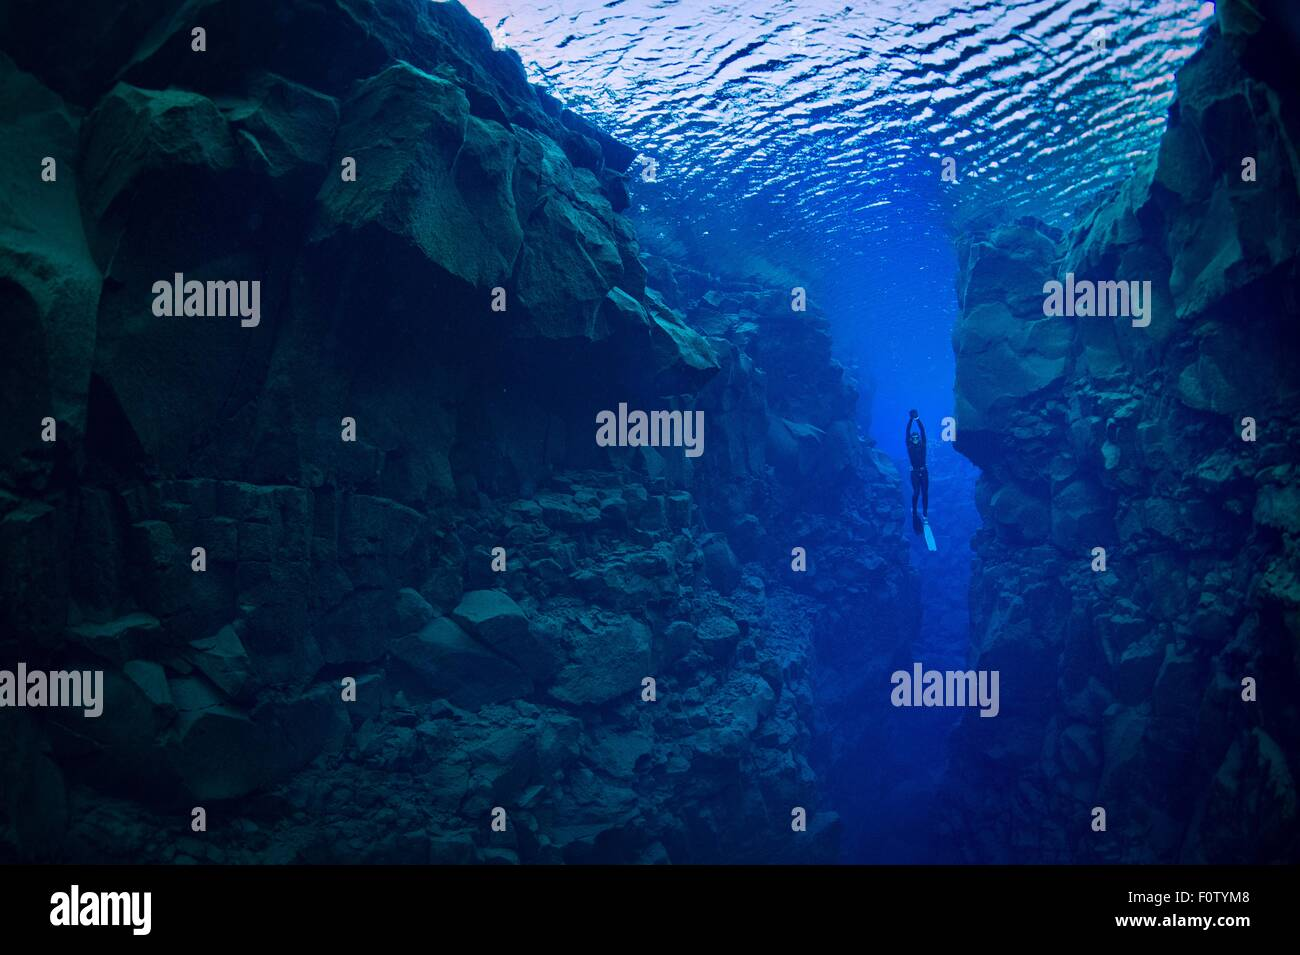 Freediver, Silfra, Iceland - Stock Image